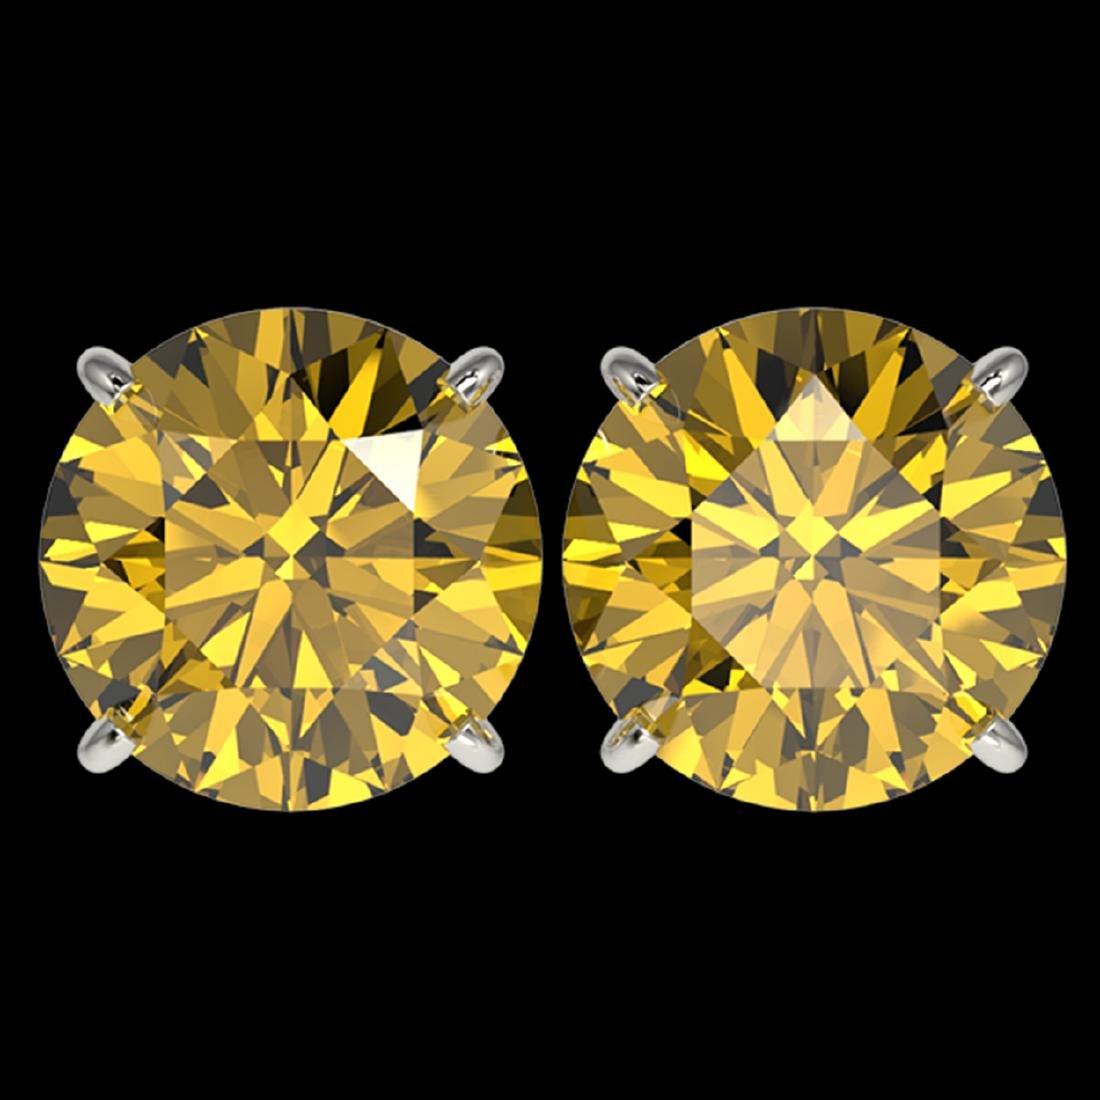 5 ctw Intense Yellow Diamond Stud Earrings 10K White